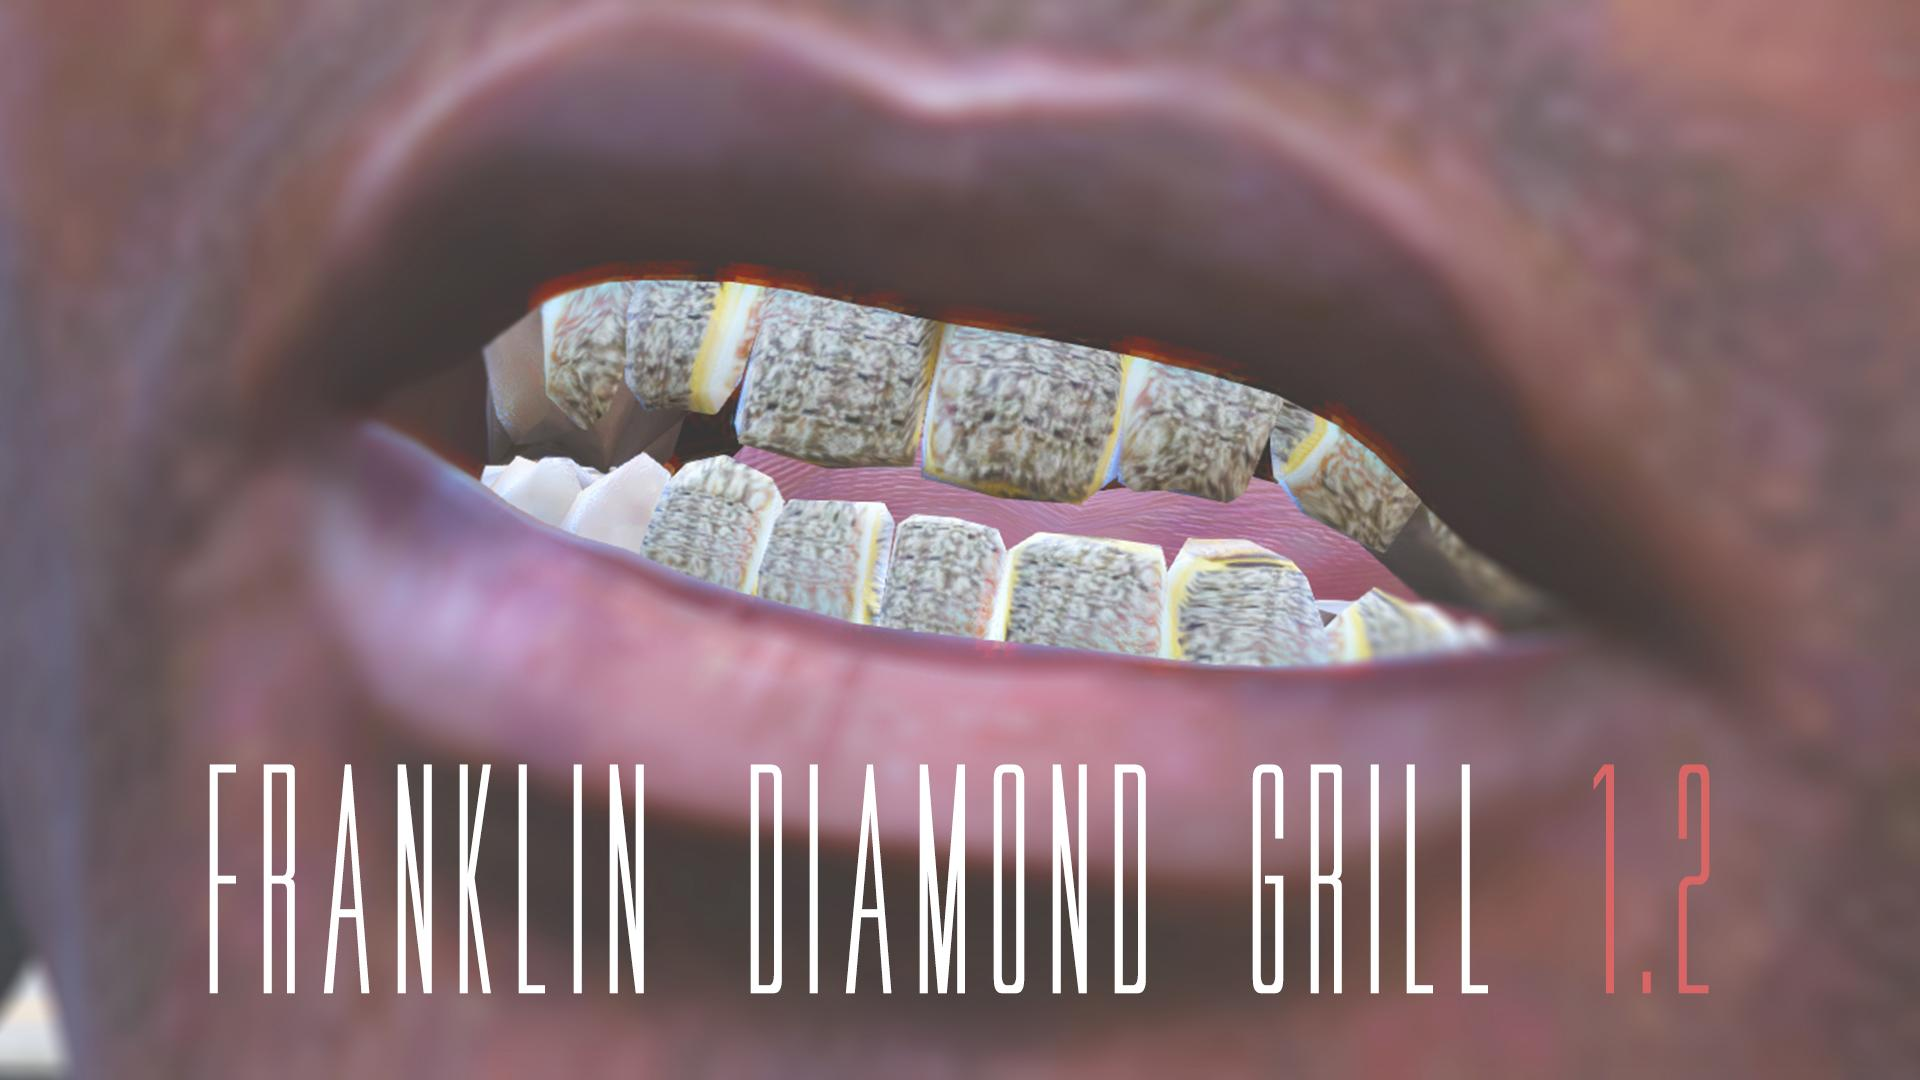 Bape Wallpaper Hd Franklin Diamond Grill Gta5 Mods Com